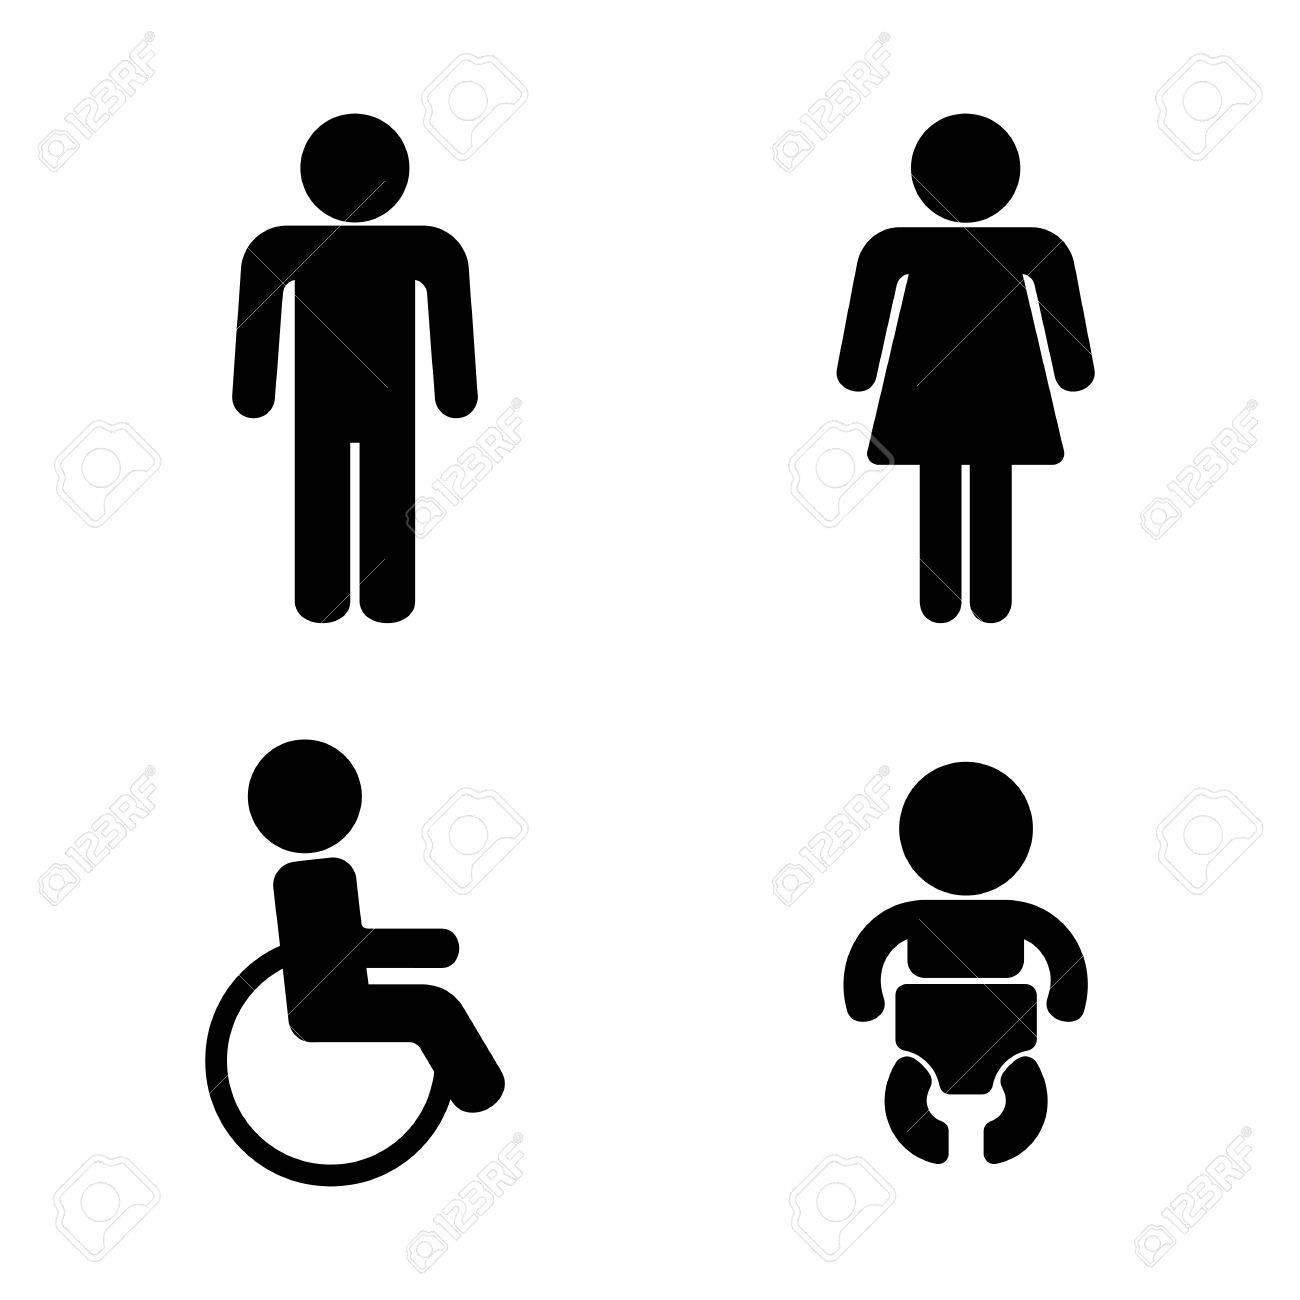 https://previews.123rf.com/images/bonumopus/bonumopus1612/bonumopus161200723/67279396-set-di-web-4-bagno-e-le-icone-di-telefonia-mobile-l-uomo-donna-bambino-la-disabilit%C3%A0-.jpg